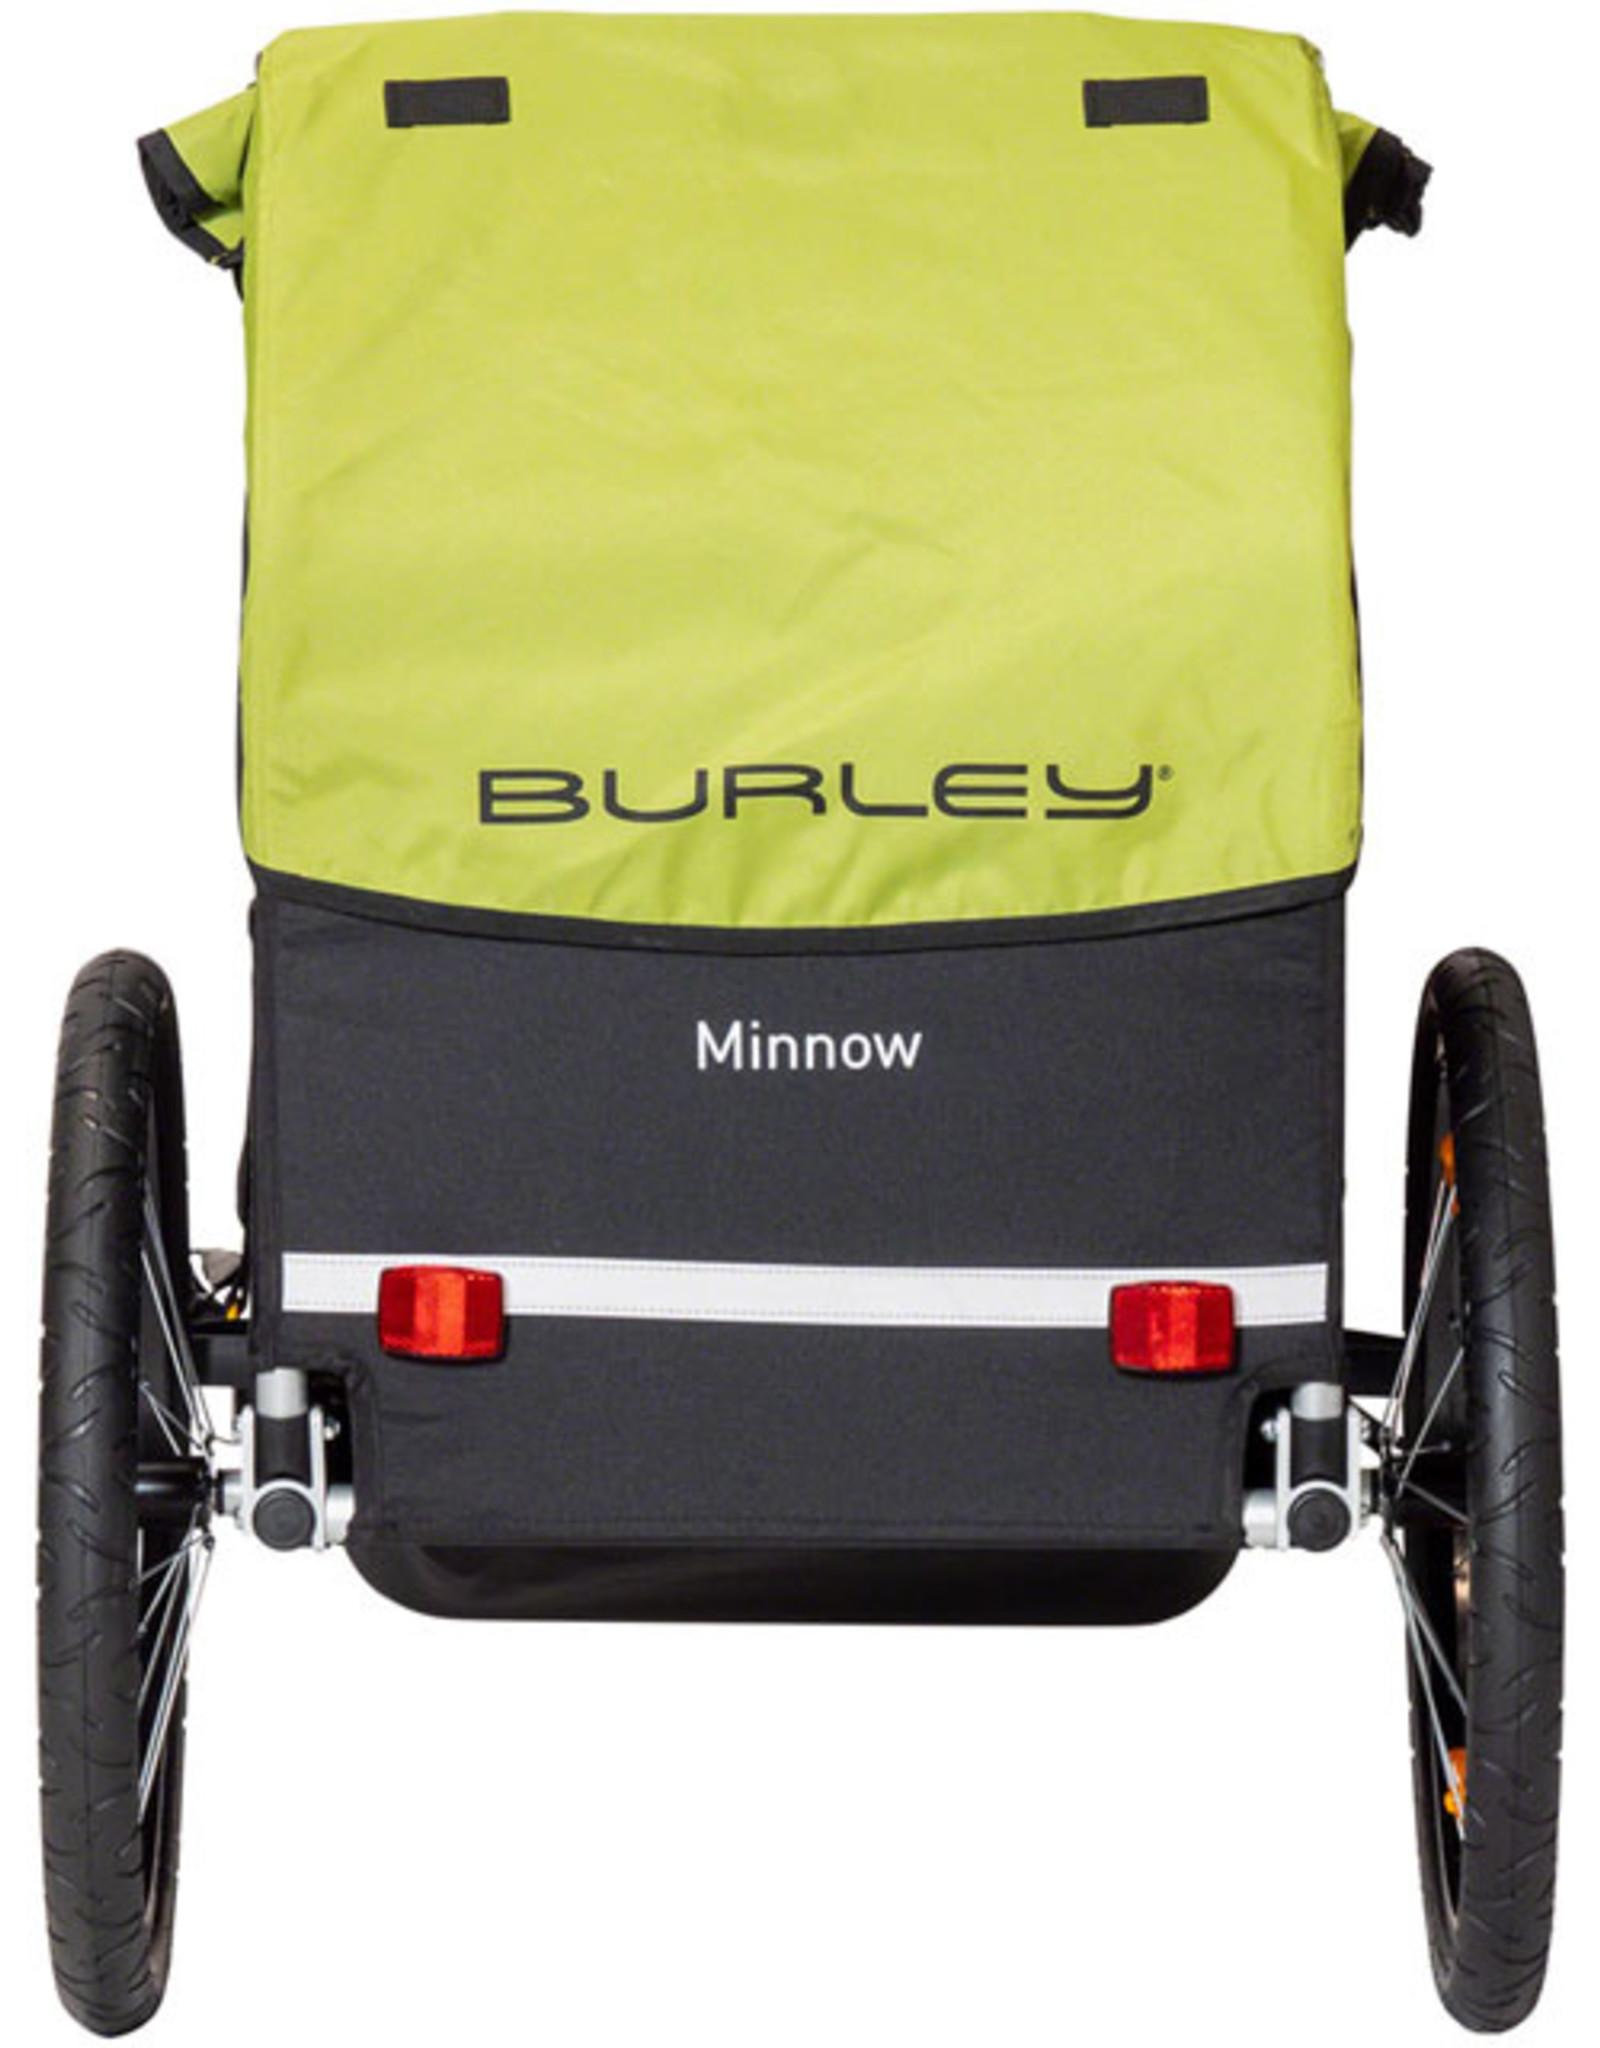 Burley Burley Minnow Child Trailer